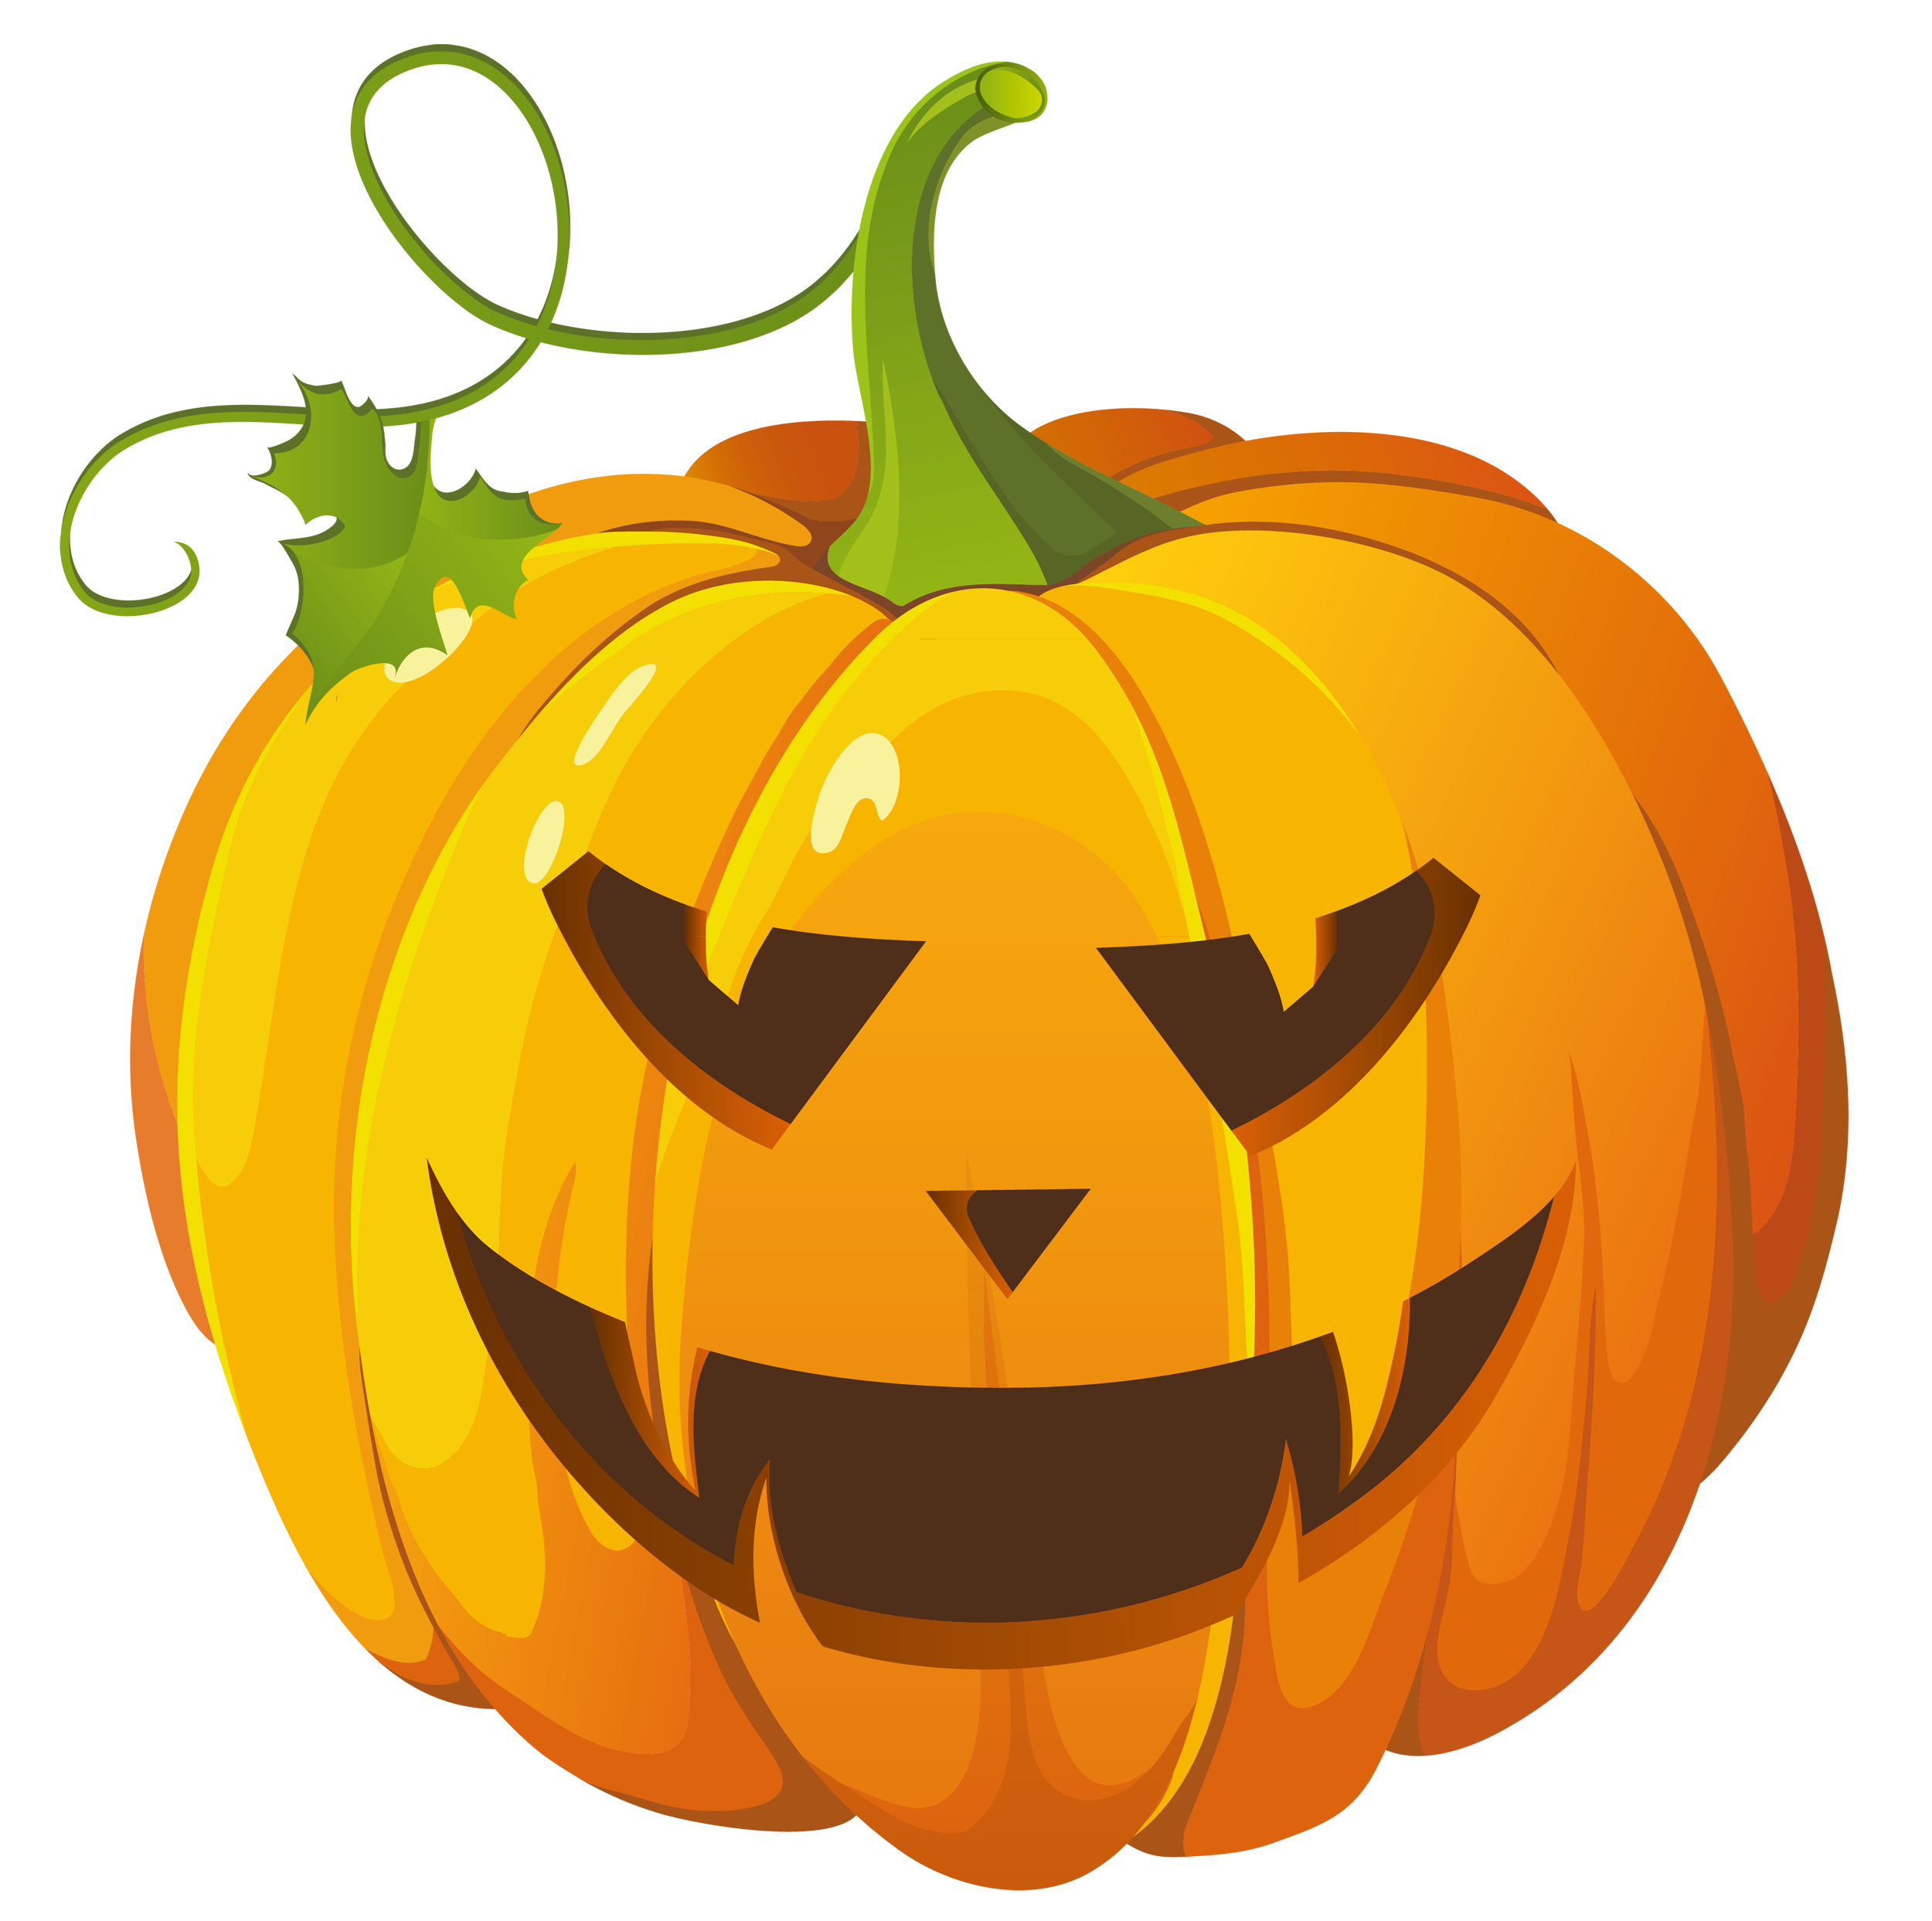 Pumpkin emma